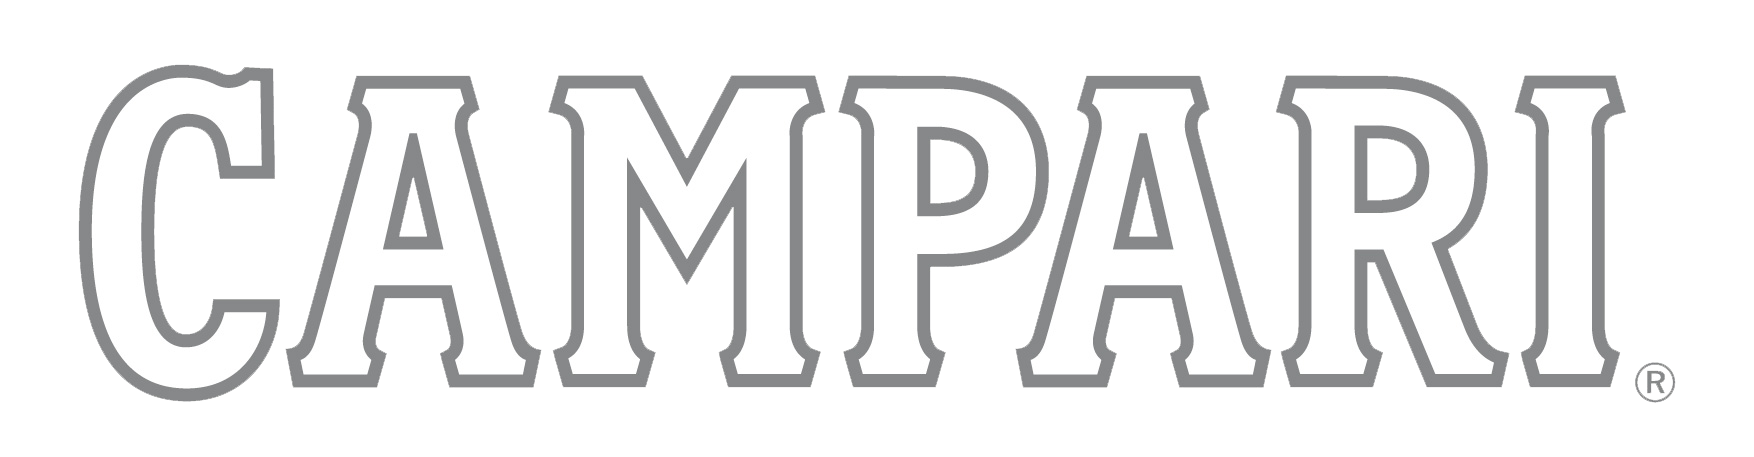 Campari Bittersweet logo